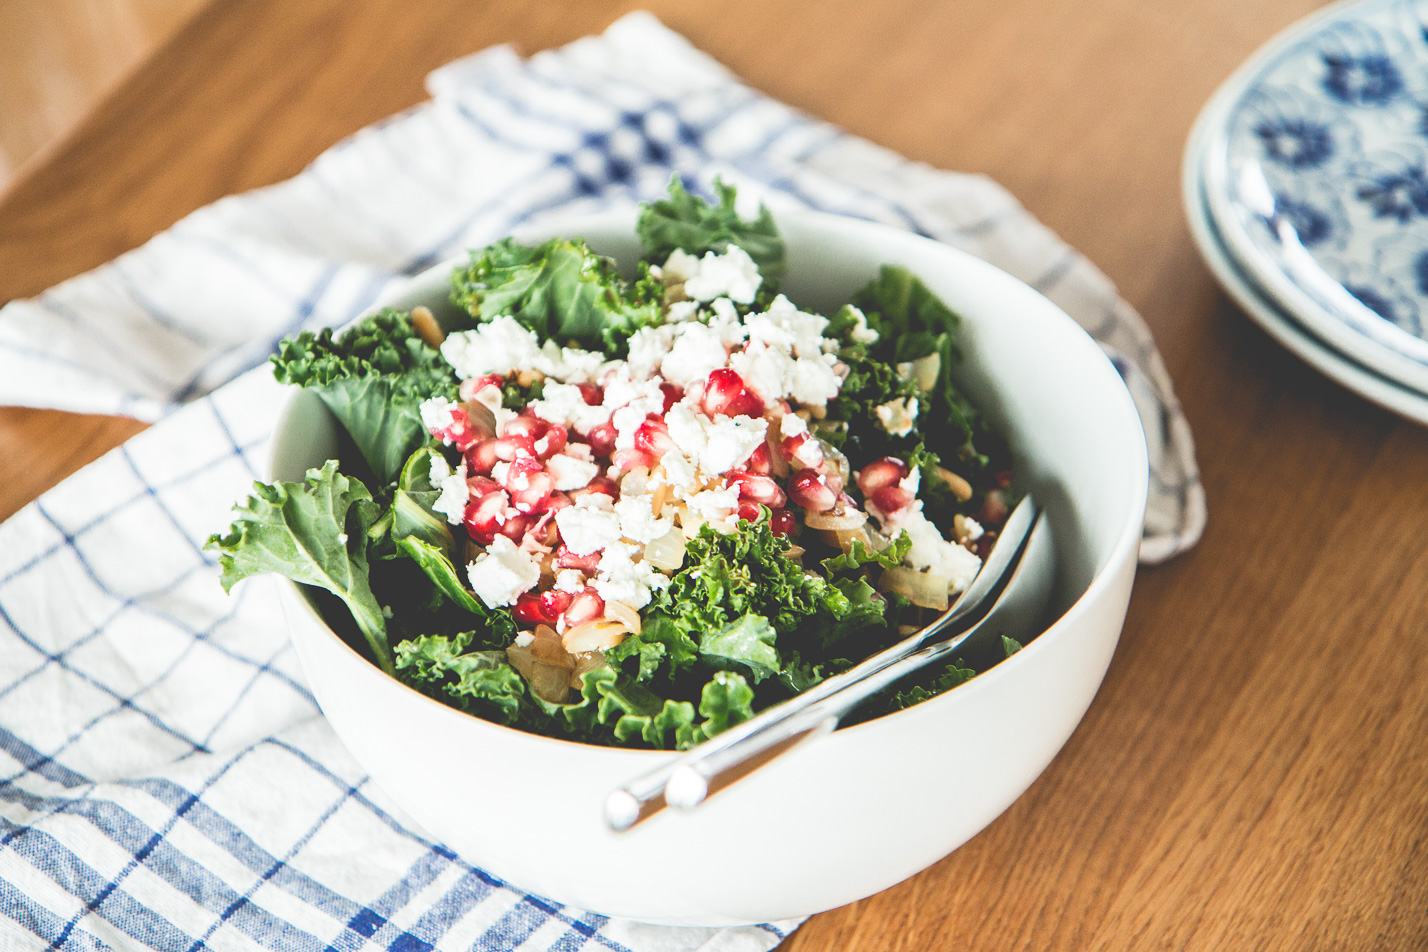 pomegranate-kale-salad-recipe11